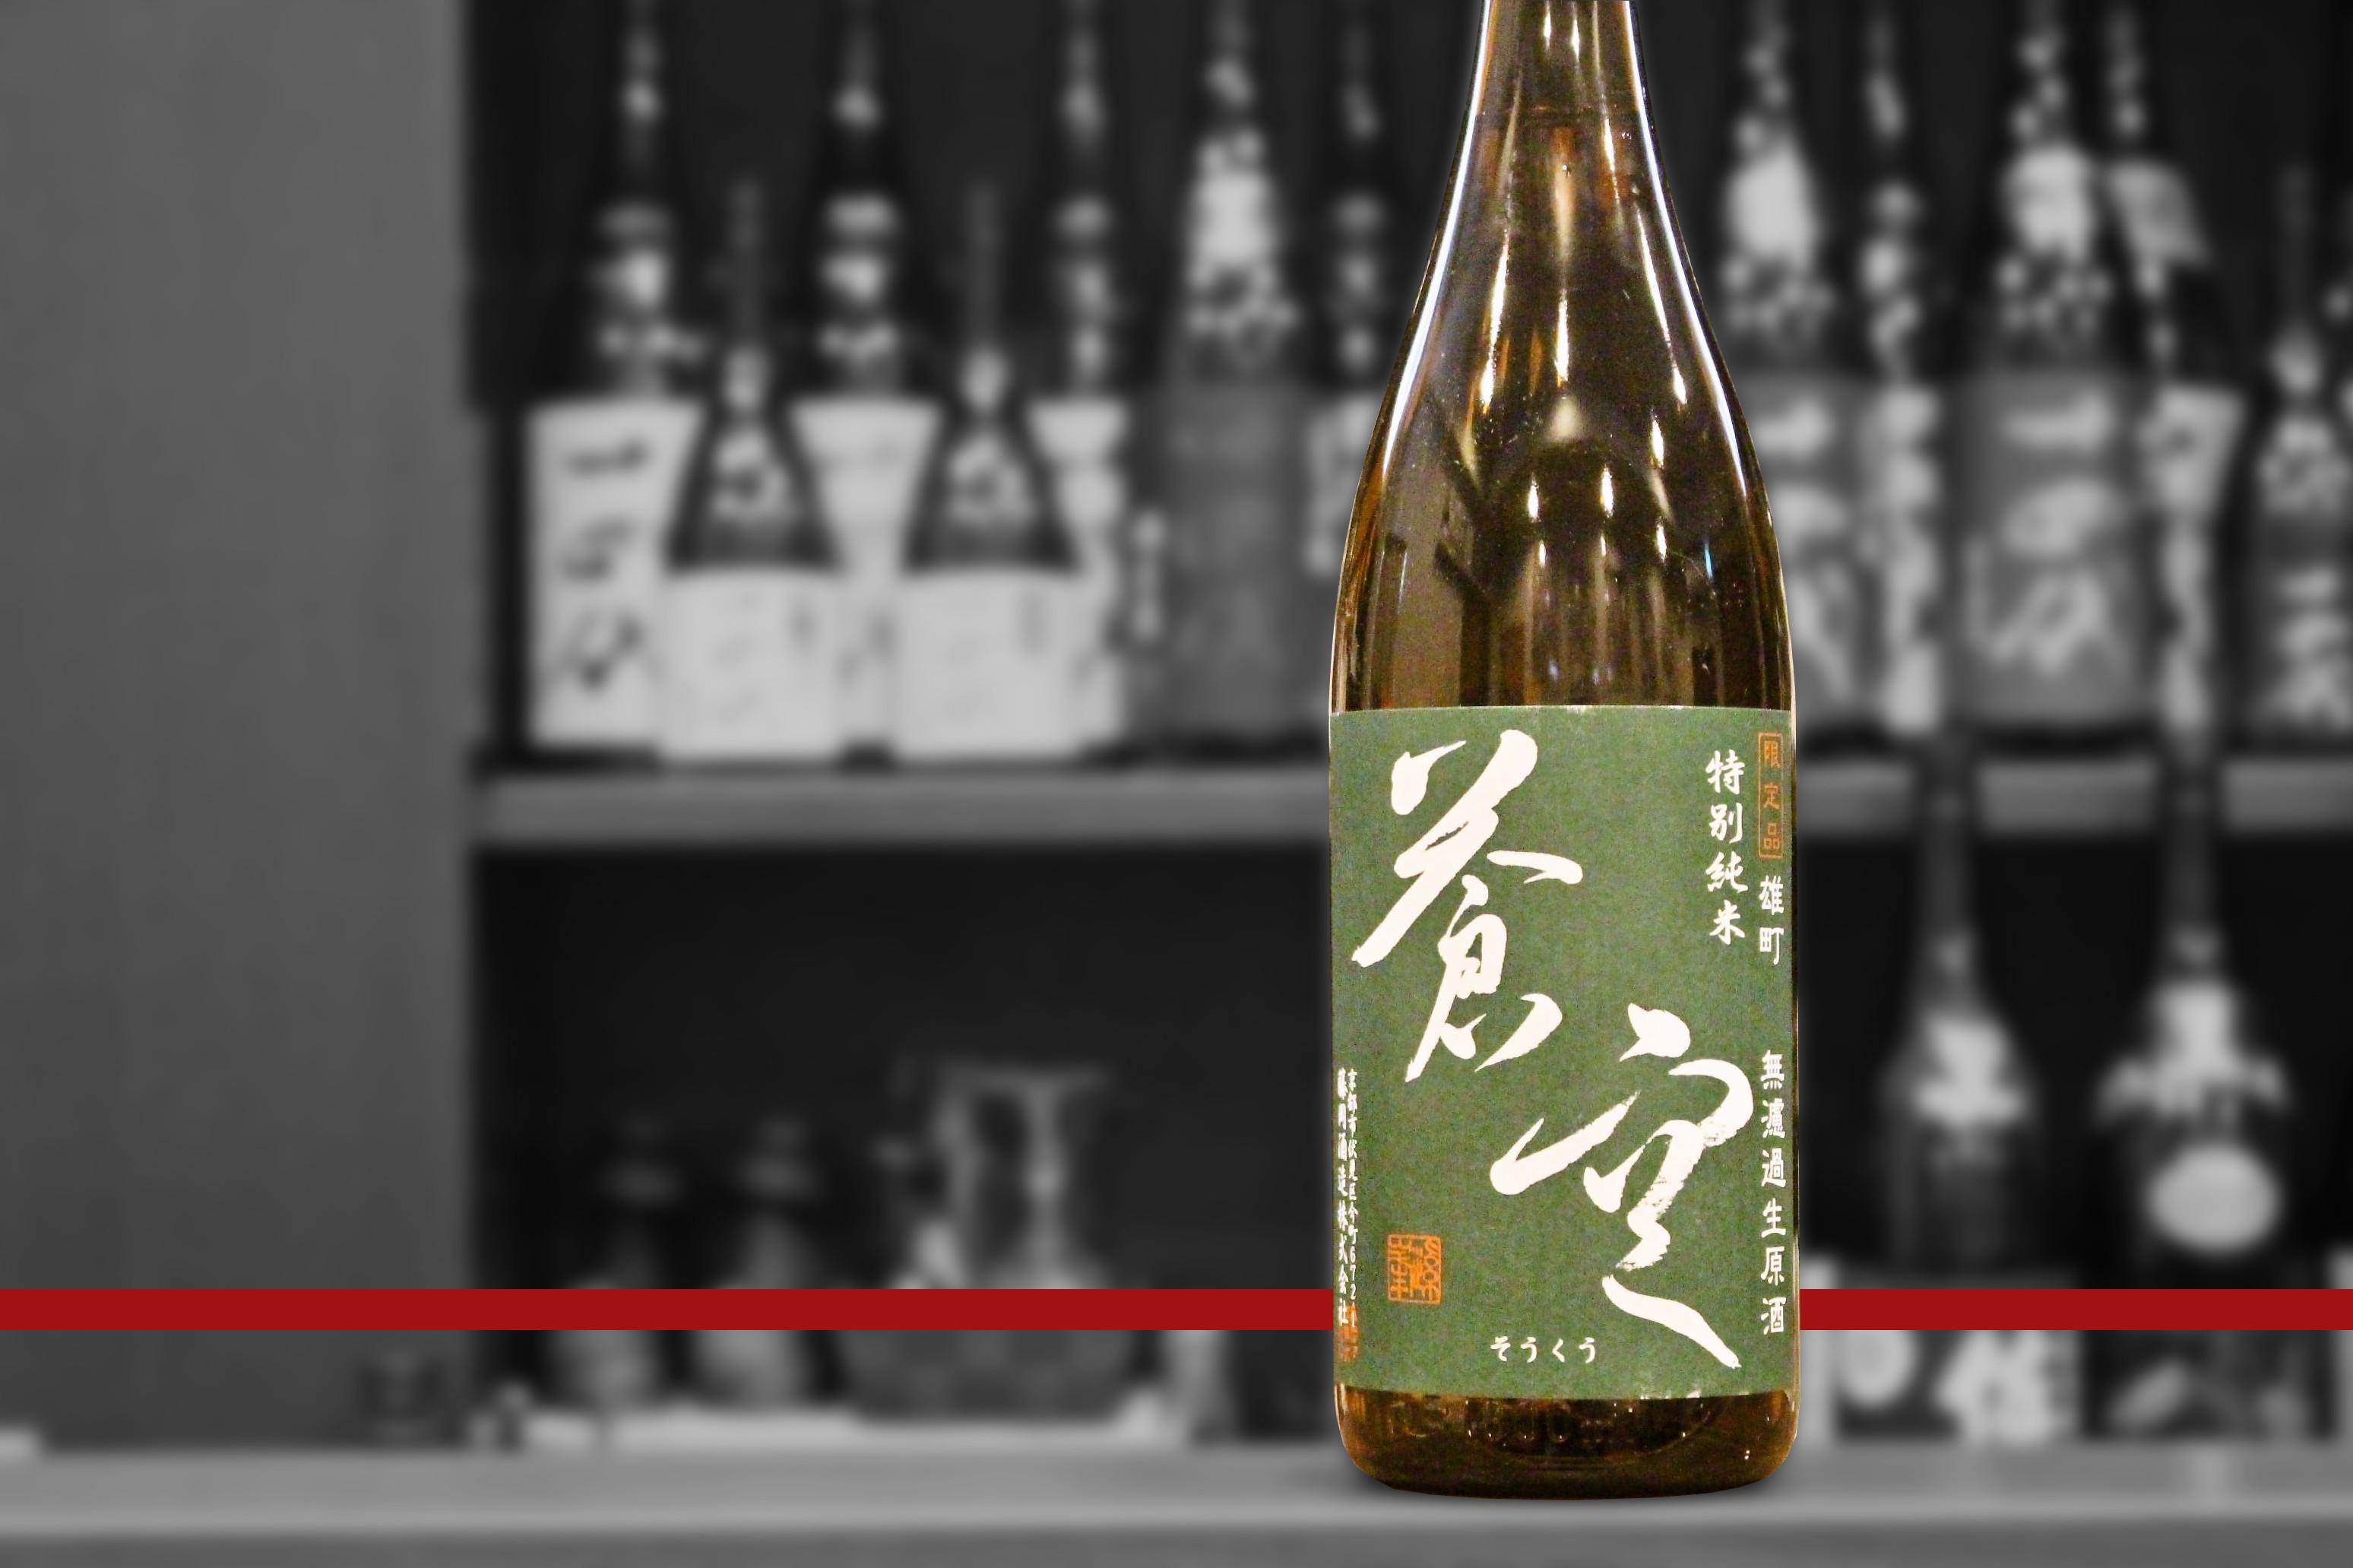 blog蒼空特別純米雄町無濾過生原酒202109